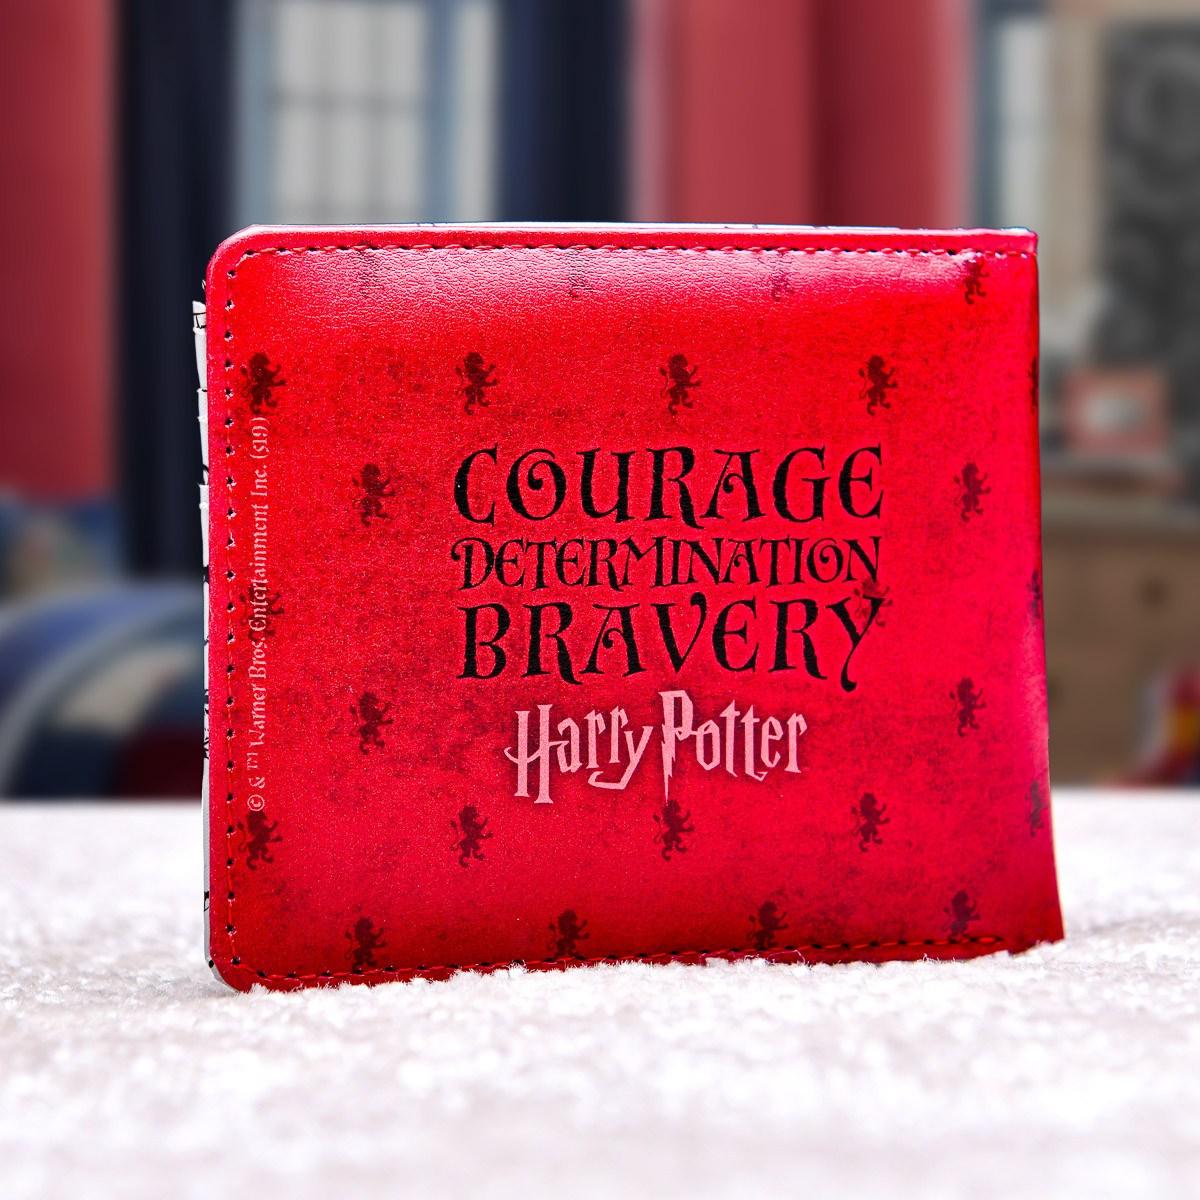 Harry Potter Kidboxeo